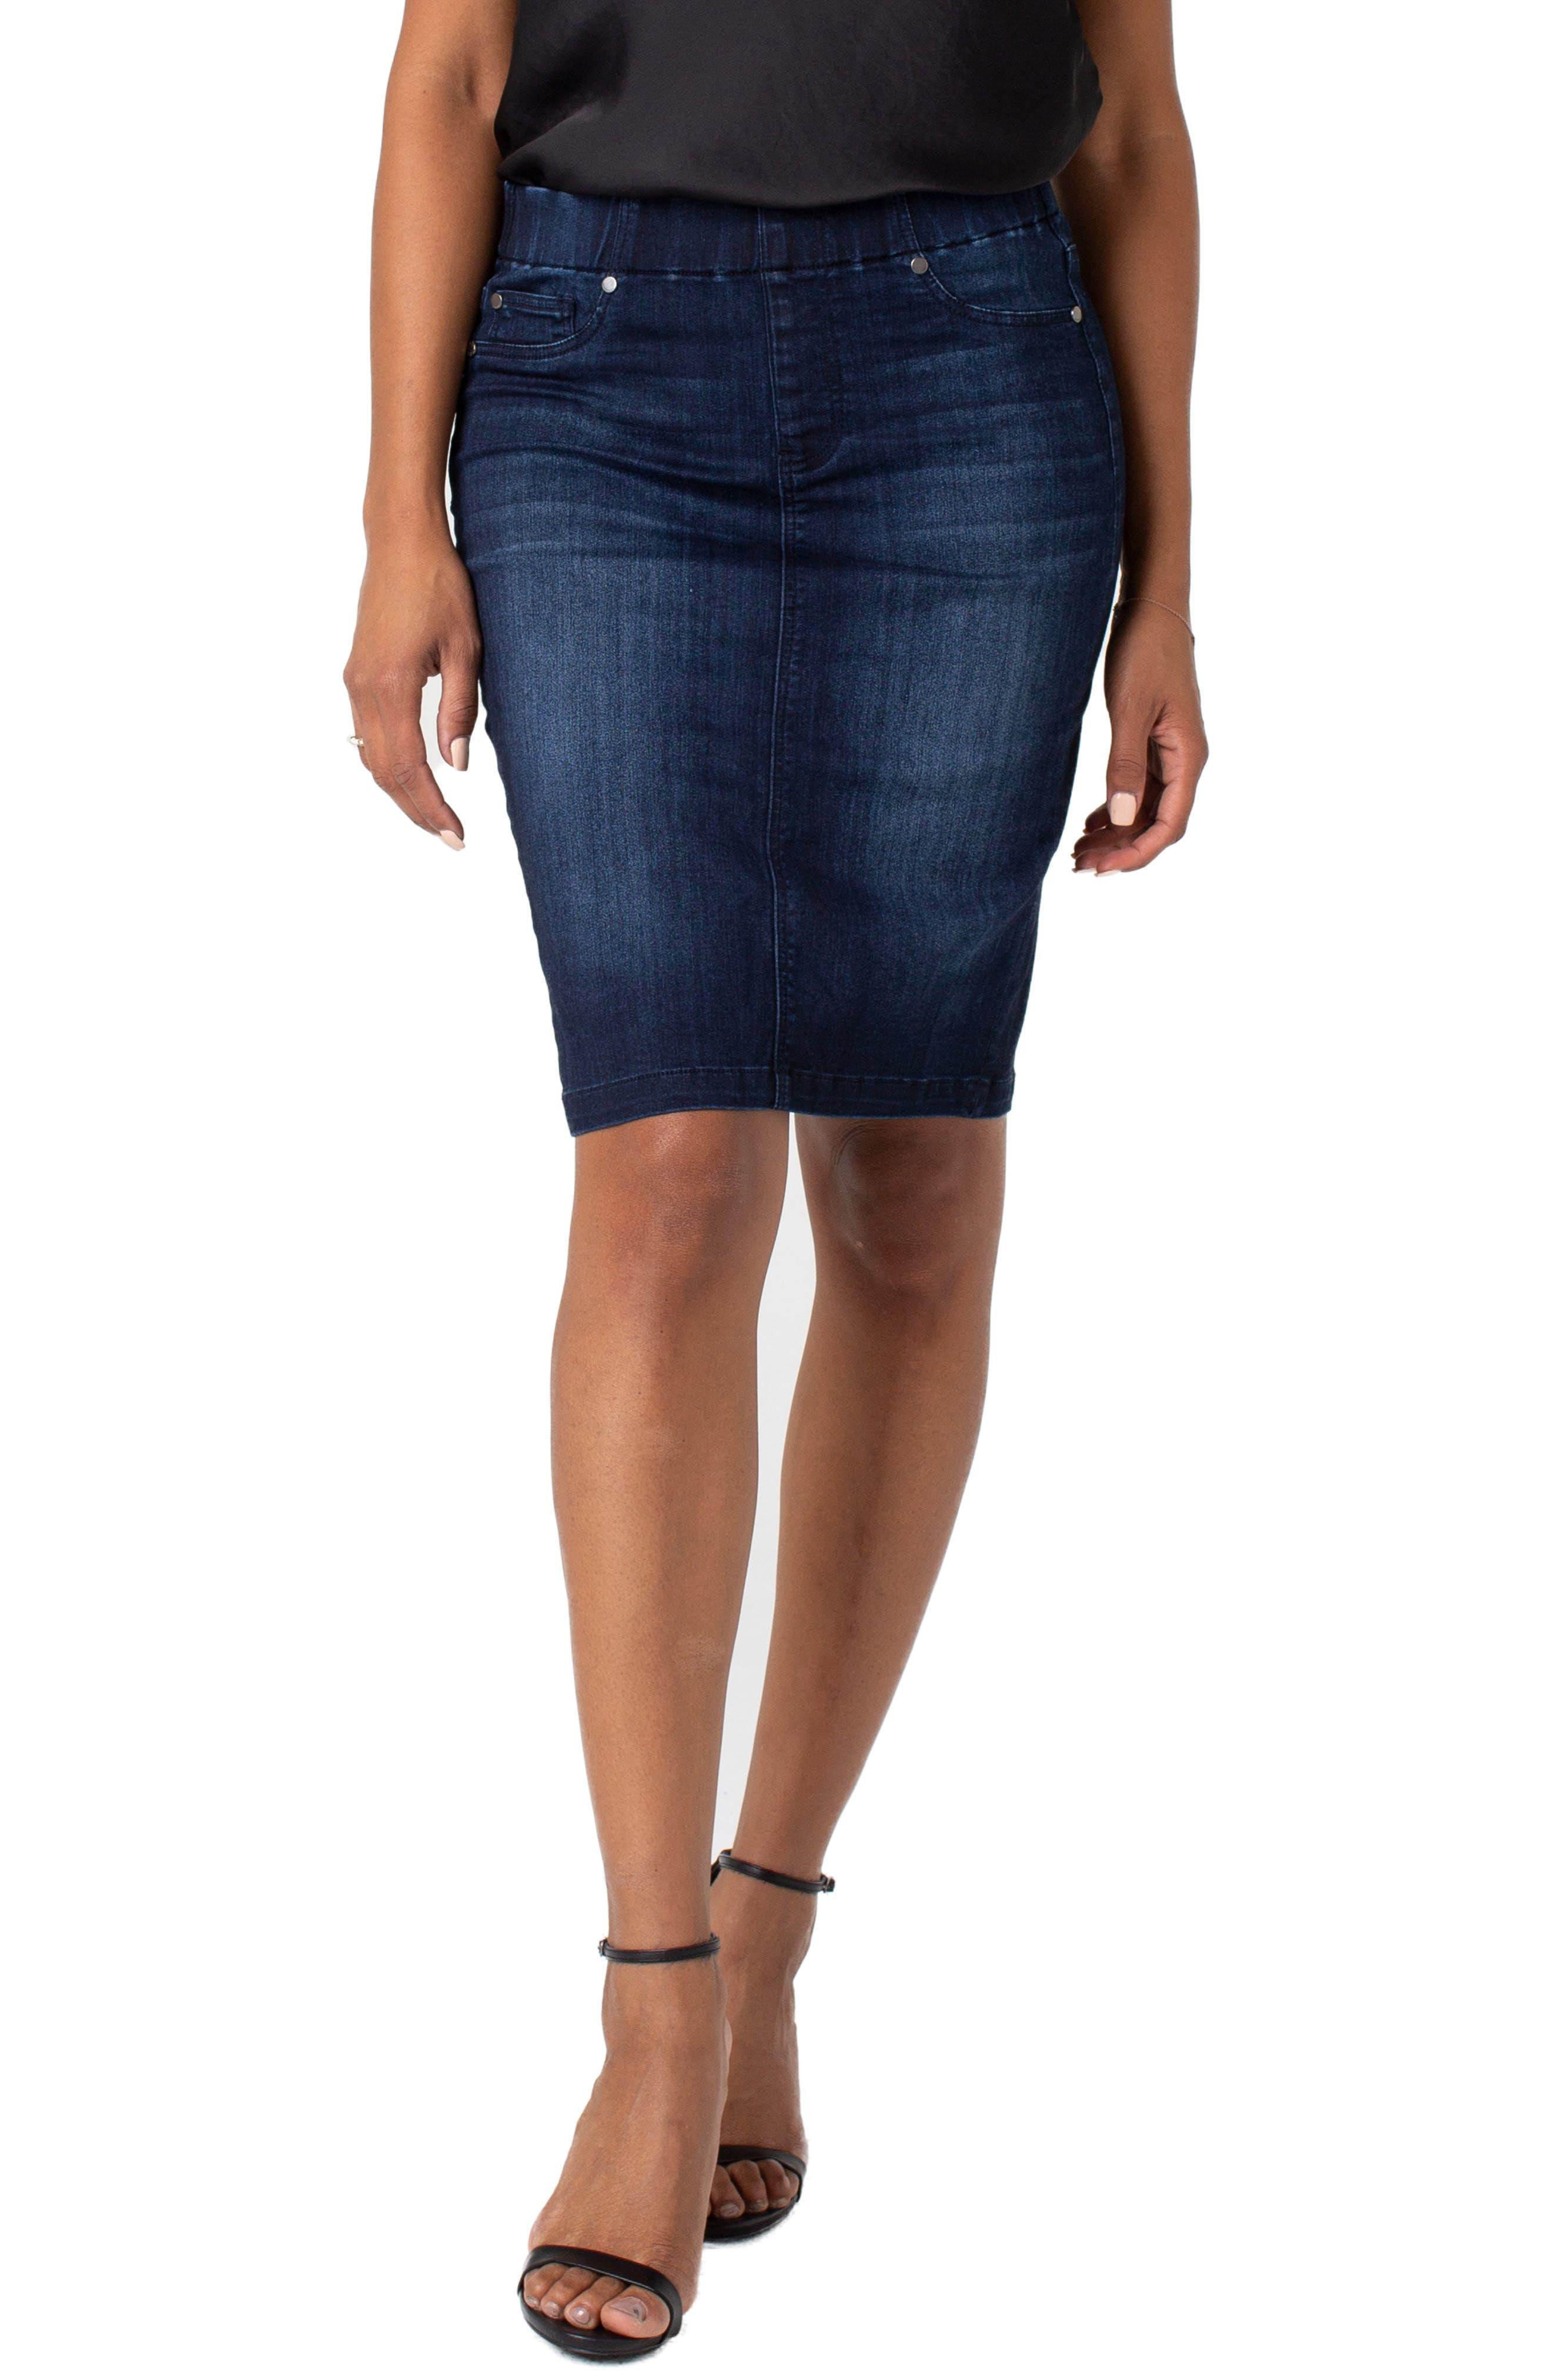 Liverpool Chloe Denim Pencil Skirt, Blue